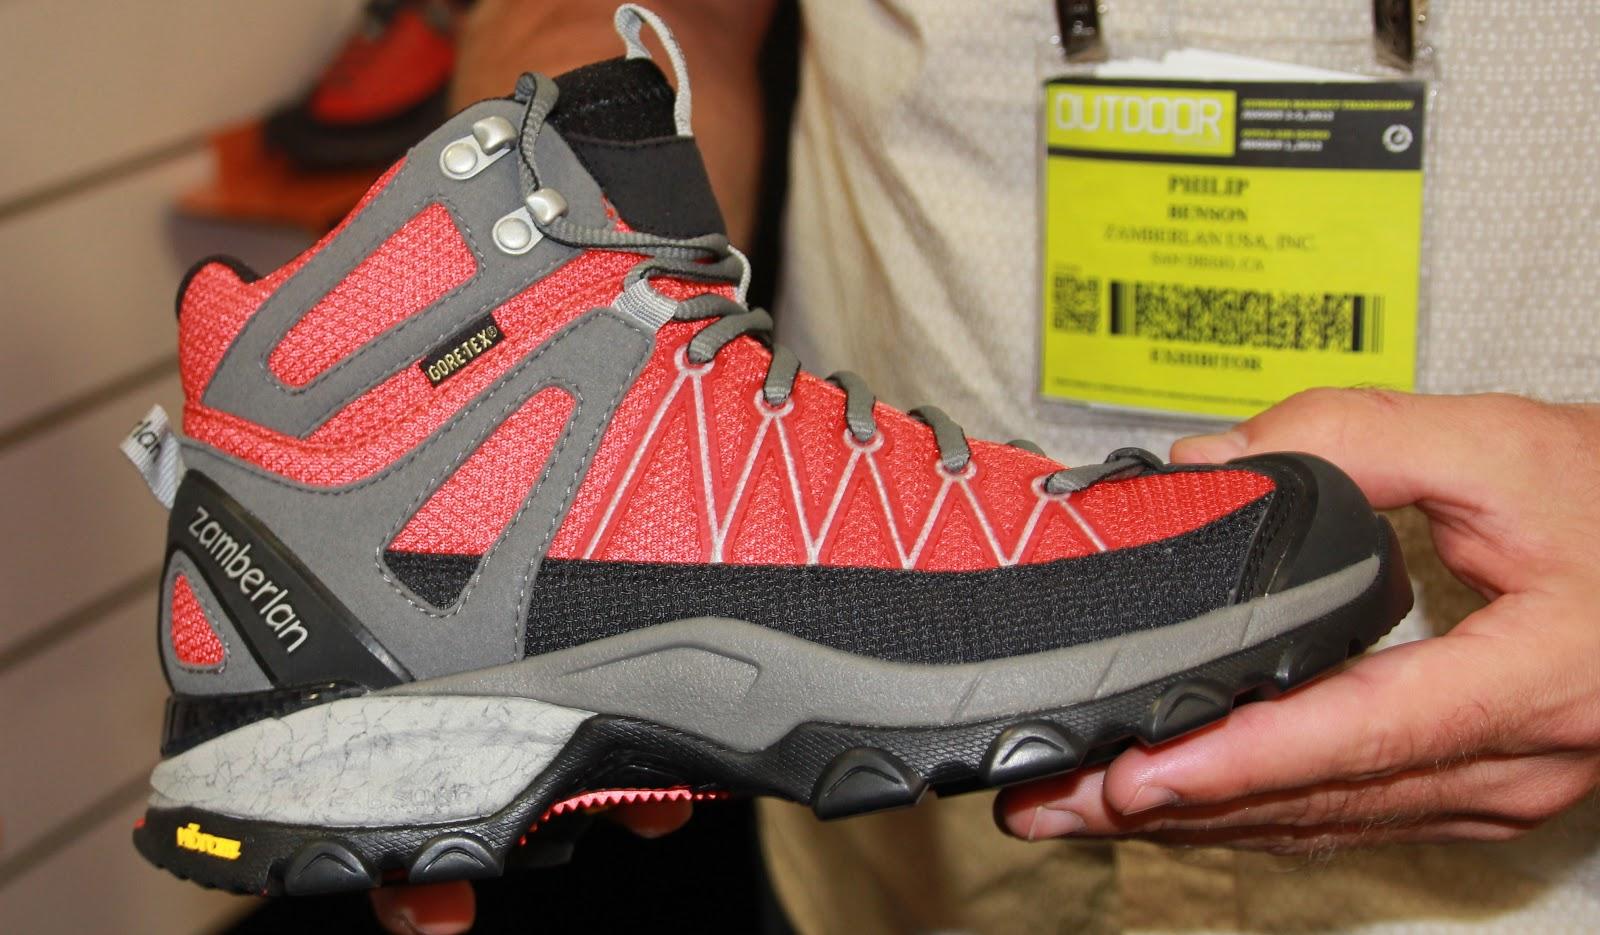 Zamberlan Footwear-Trekking, Hiking, Lifestyle Boots 2012/13